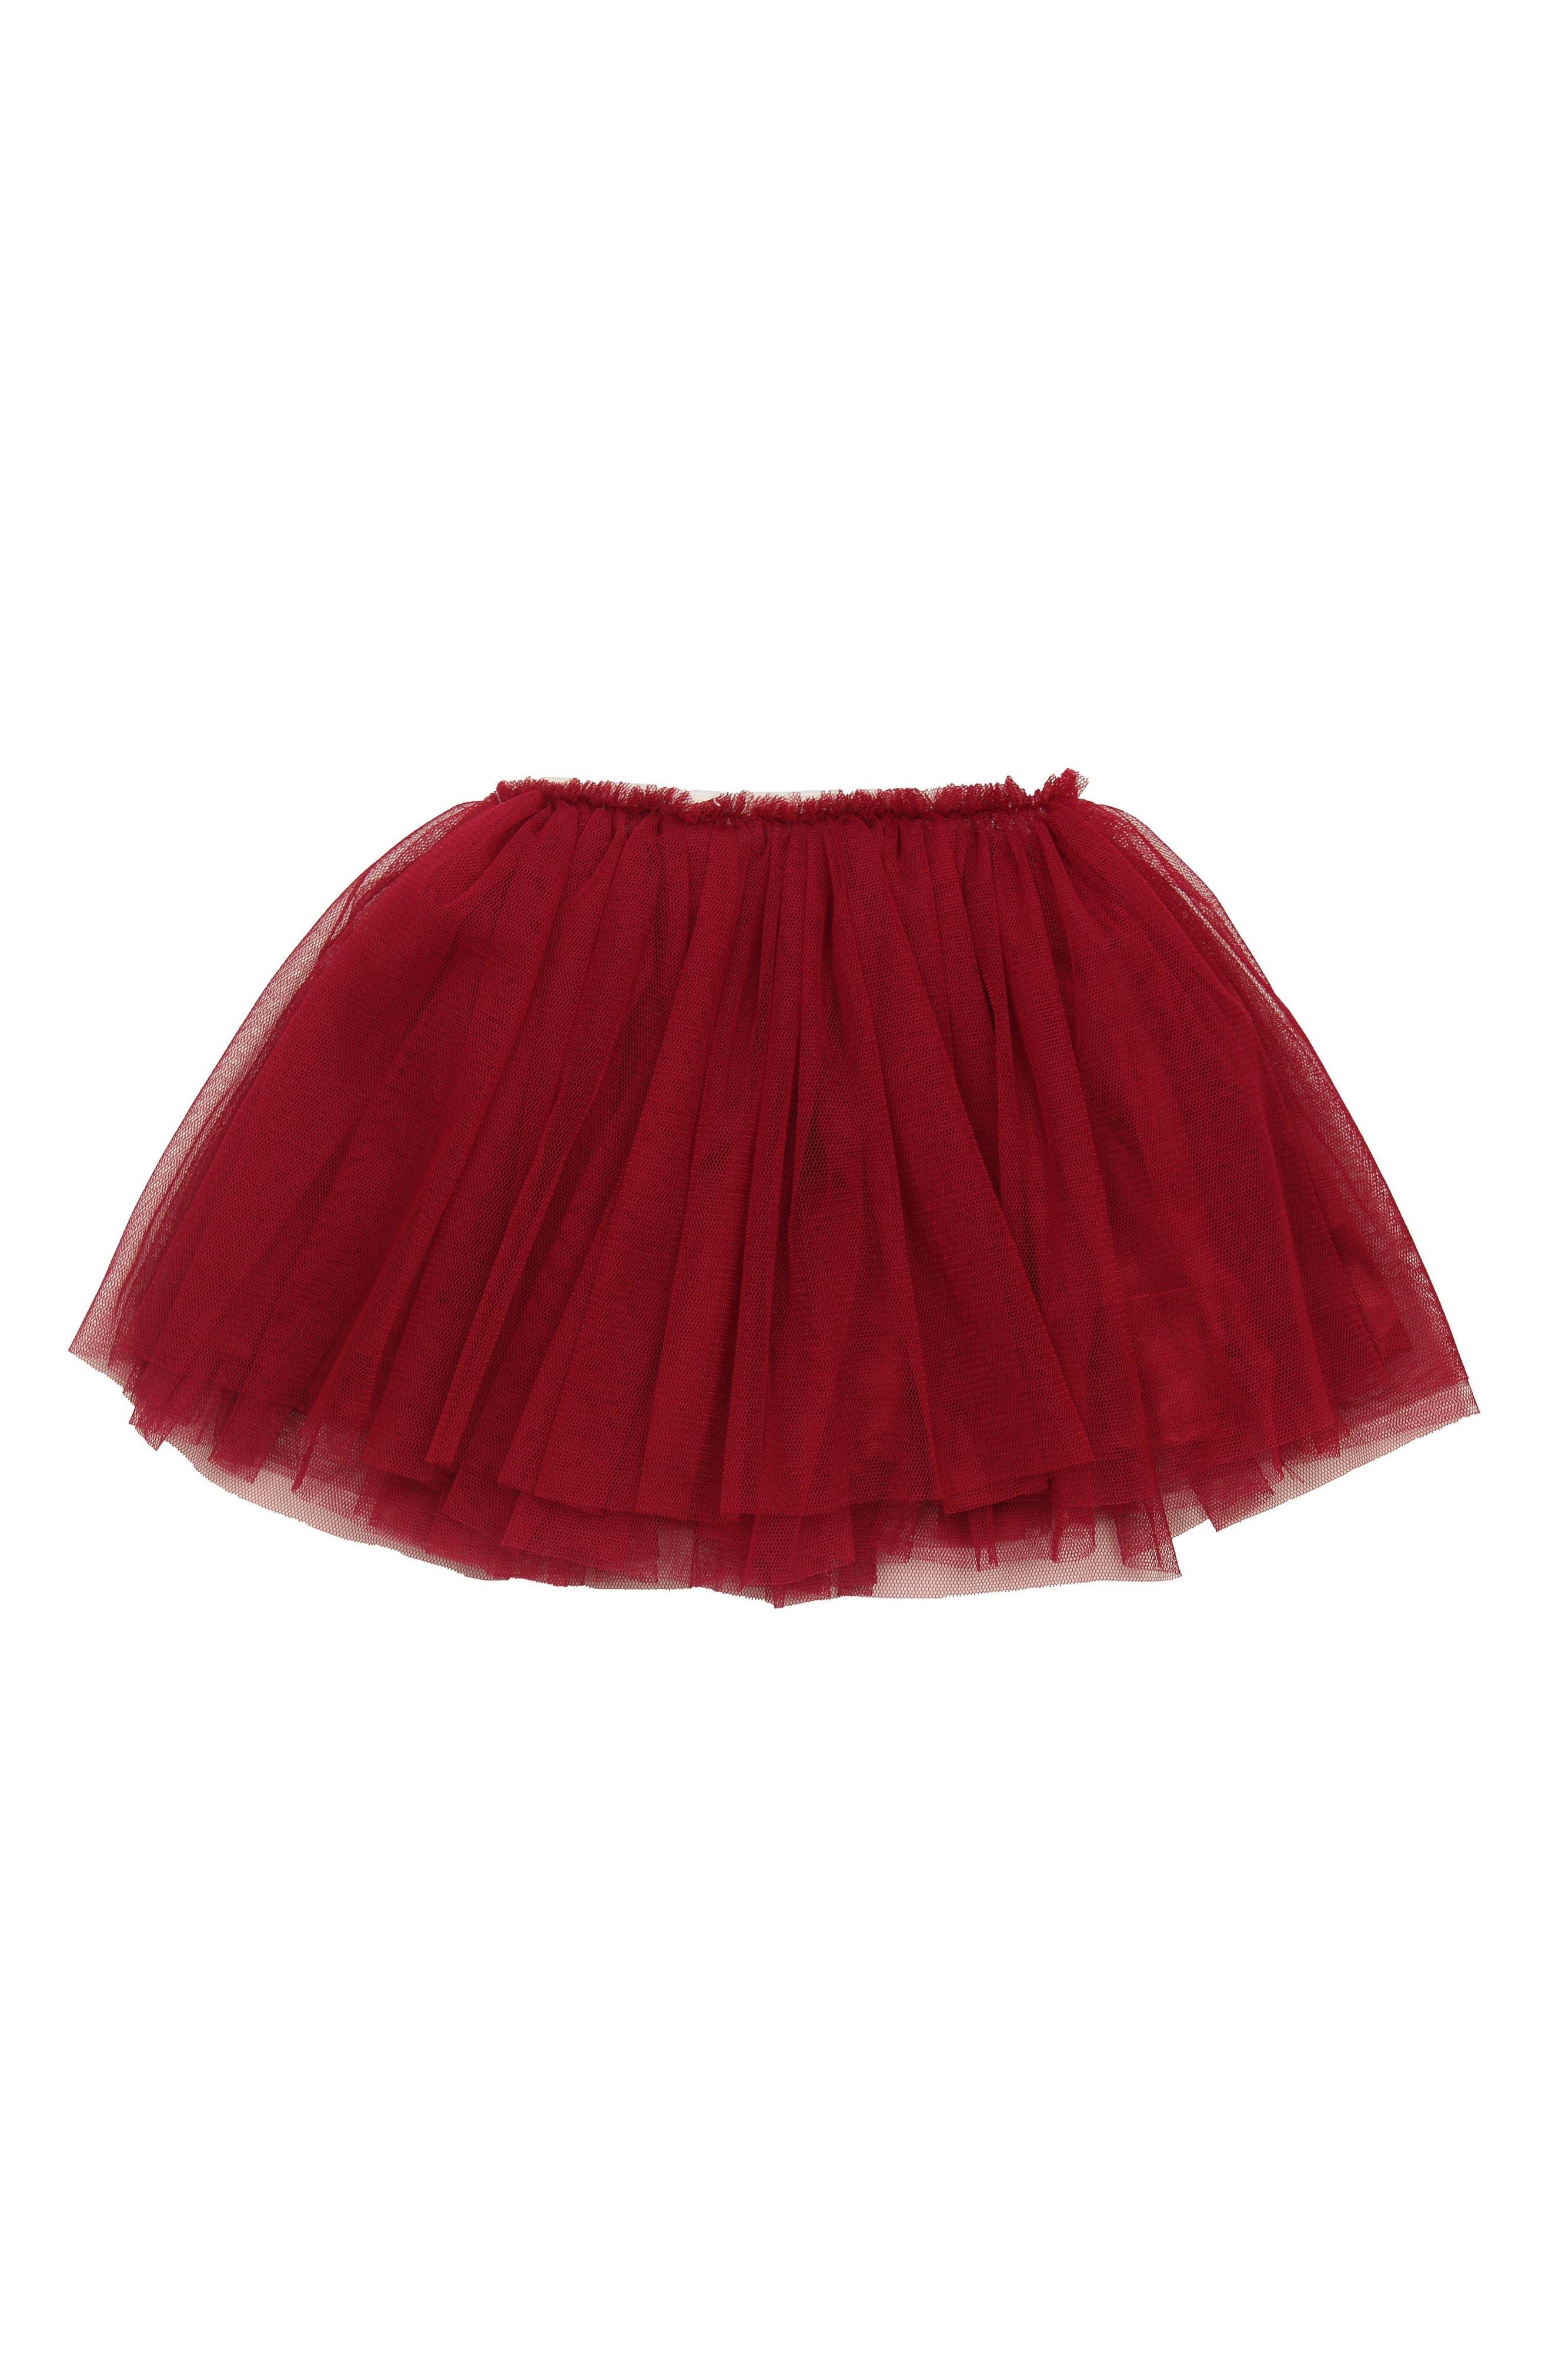 POPATU, Gold Star Tutu Skirt, Alternate thumbnail 2, color, 601